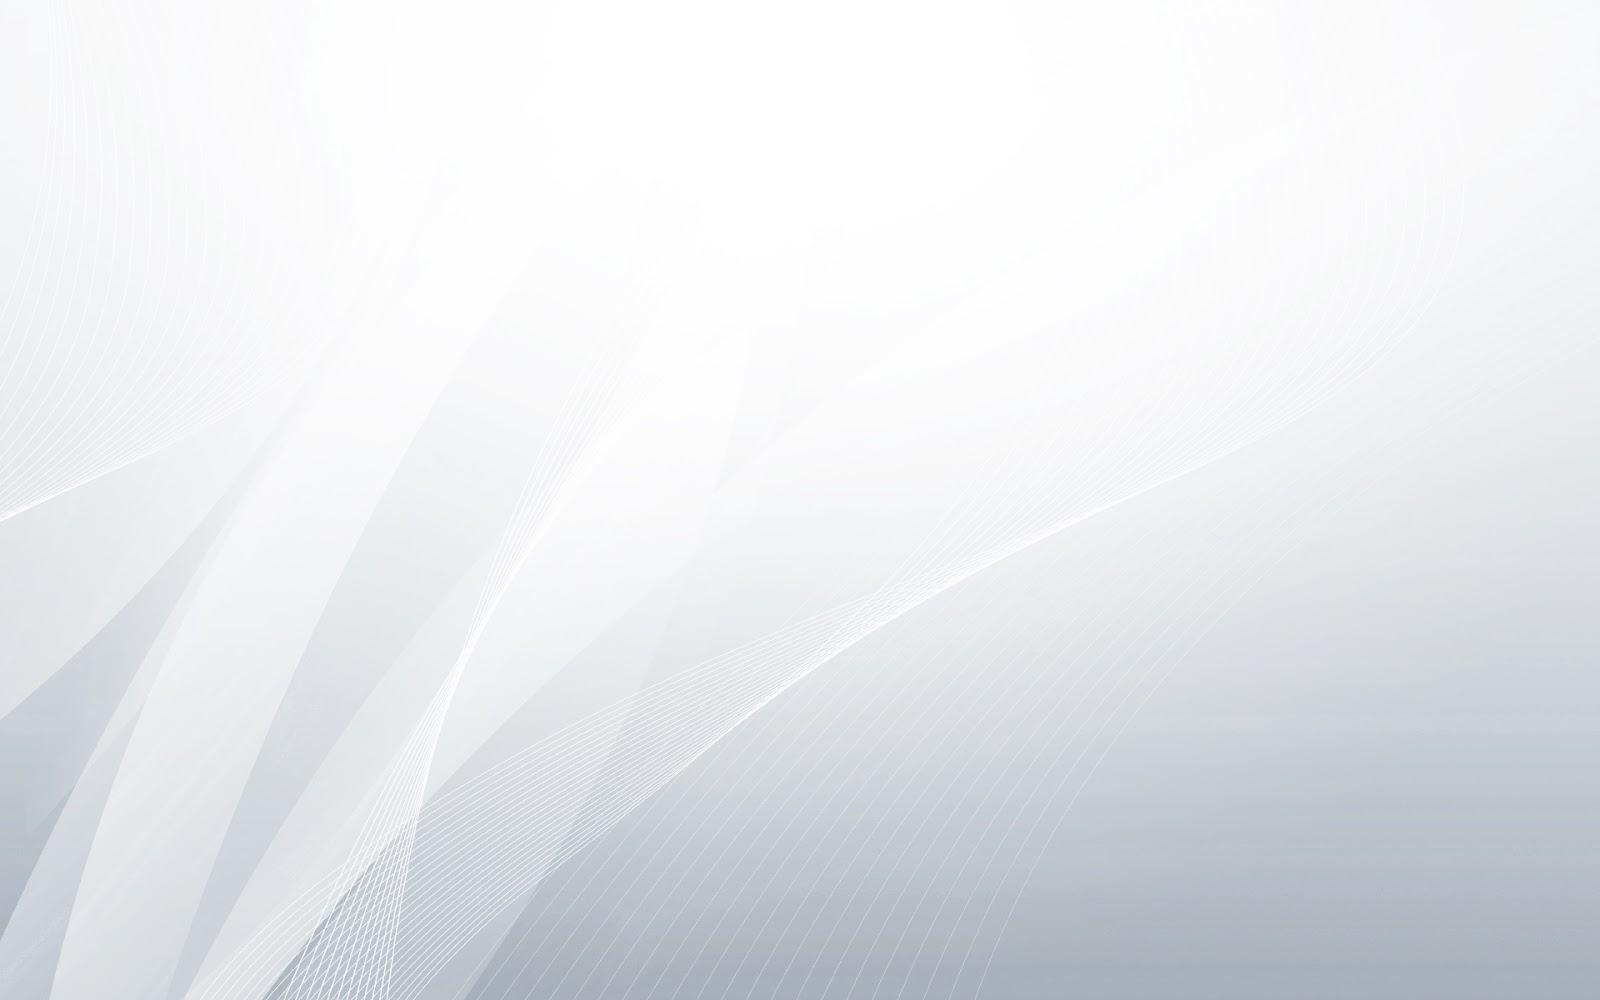 http://4.bp.blogspot.com/-wl3ZNVXOT2w/Tgtx1RgXIwI/AAAAAAAAHt8/ImCNjl4bVJE/s1600/opera+background.jpg